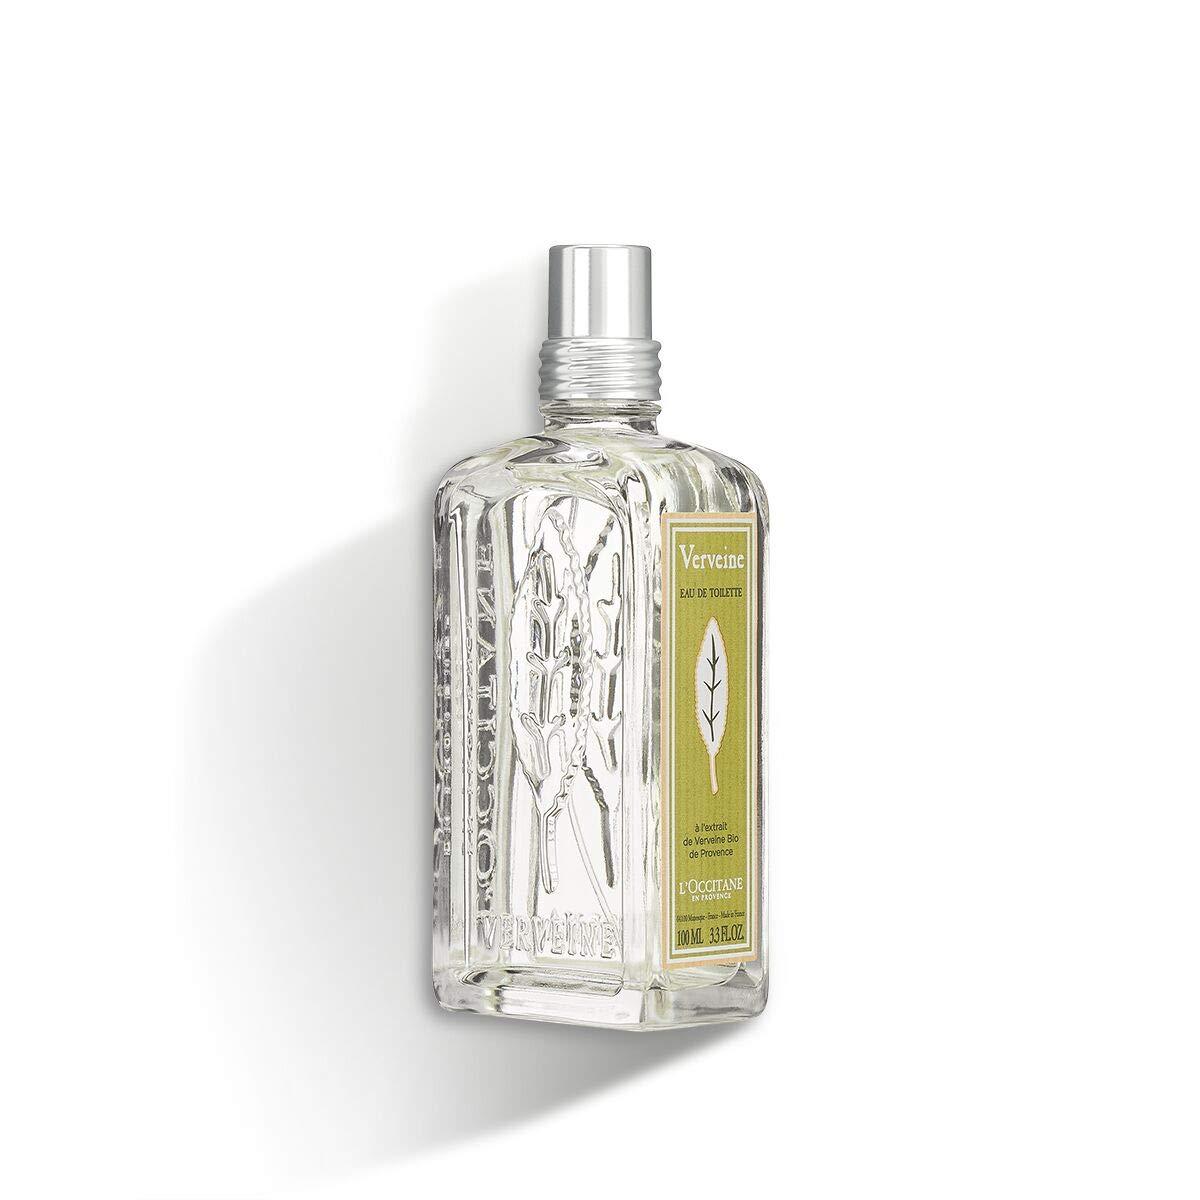 L'Occitane Refreshing Verbena Eau de Toilette Enriched with Organic Verbena, 3.3 fl. oz. by L'Occitane